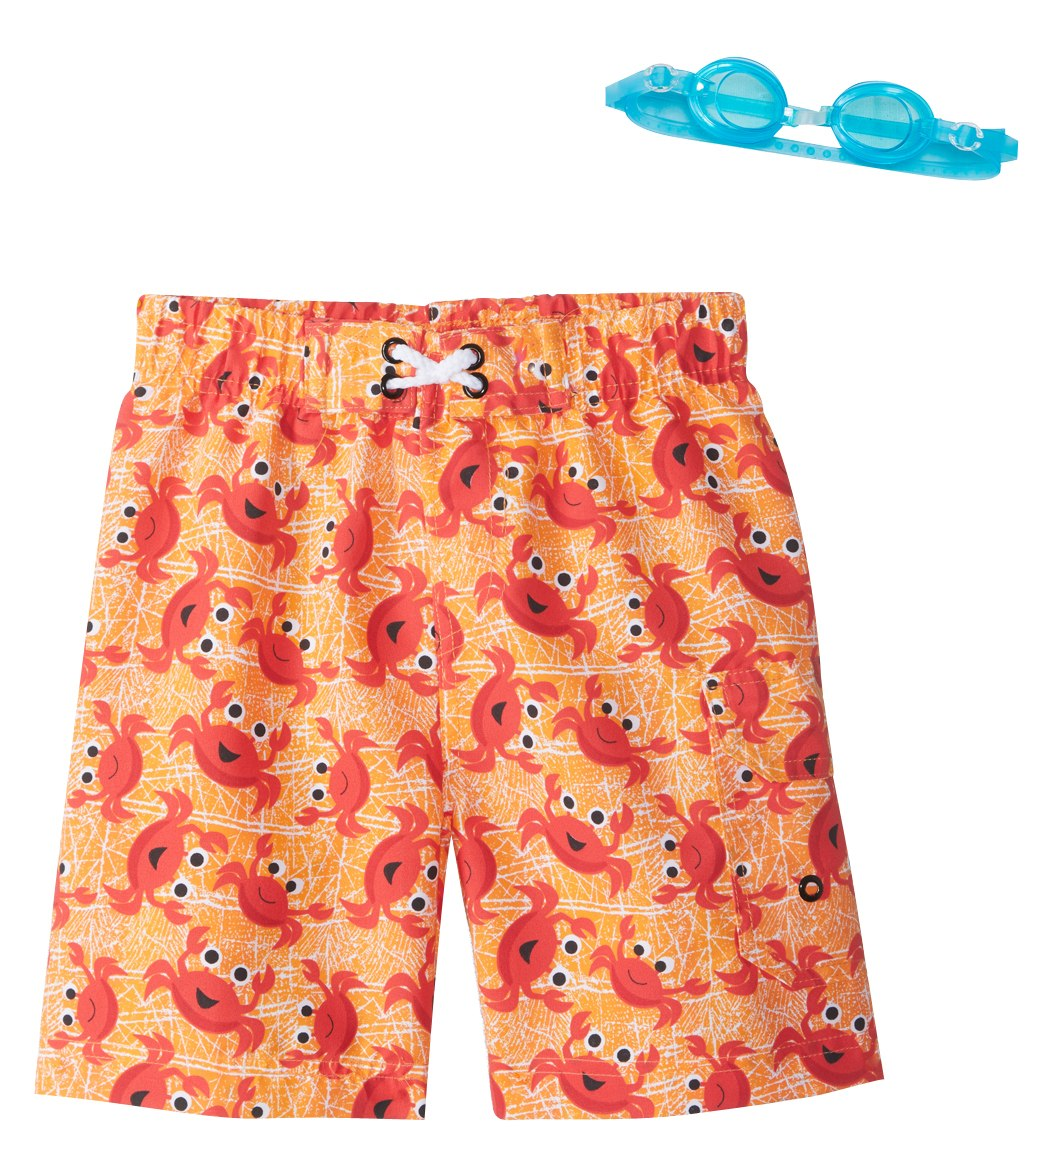 4ae017da80 Jump N Splash Boys' Little Scientist Crab Swim Trunks w/Free Goggles (5-7)  at SwimOutlet.com